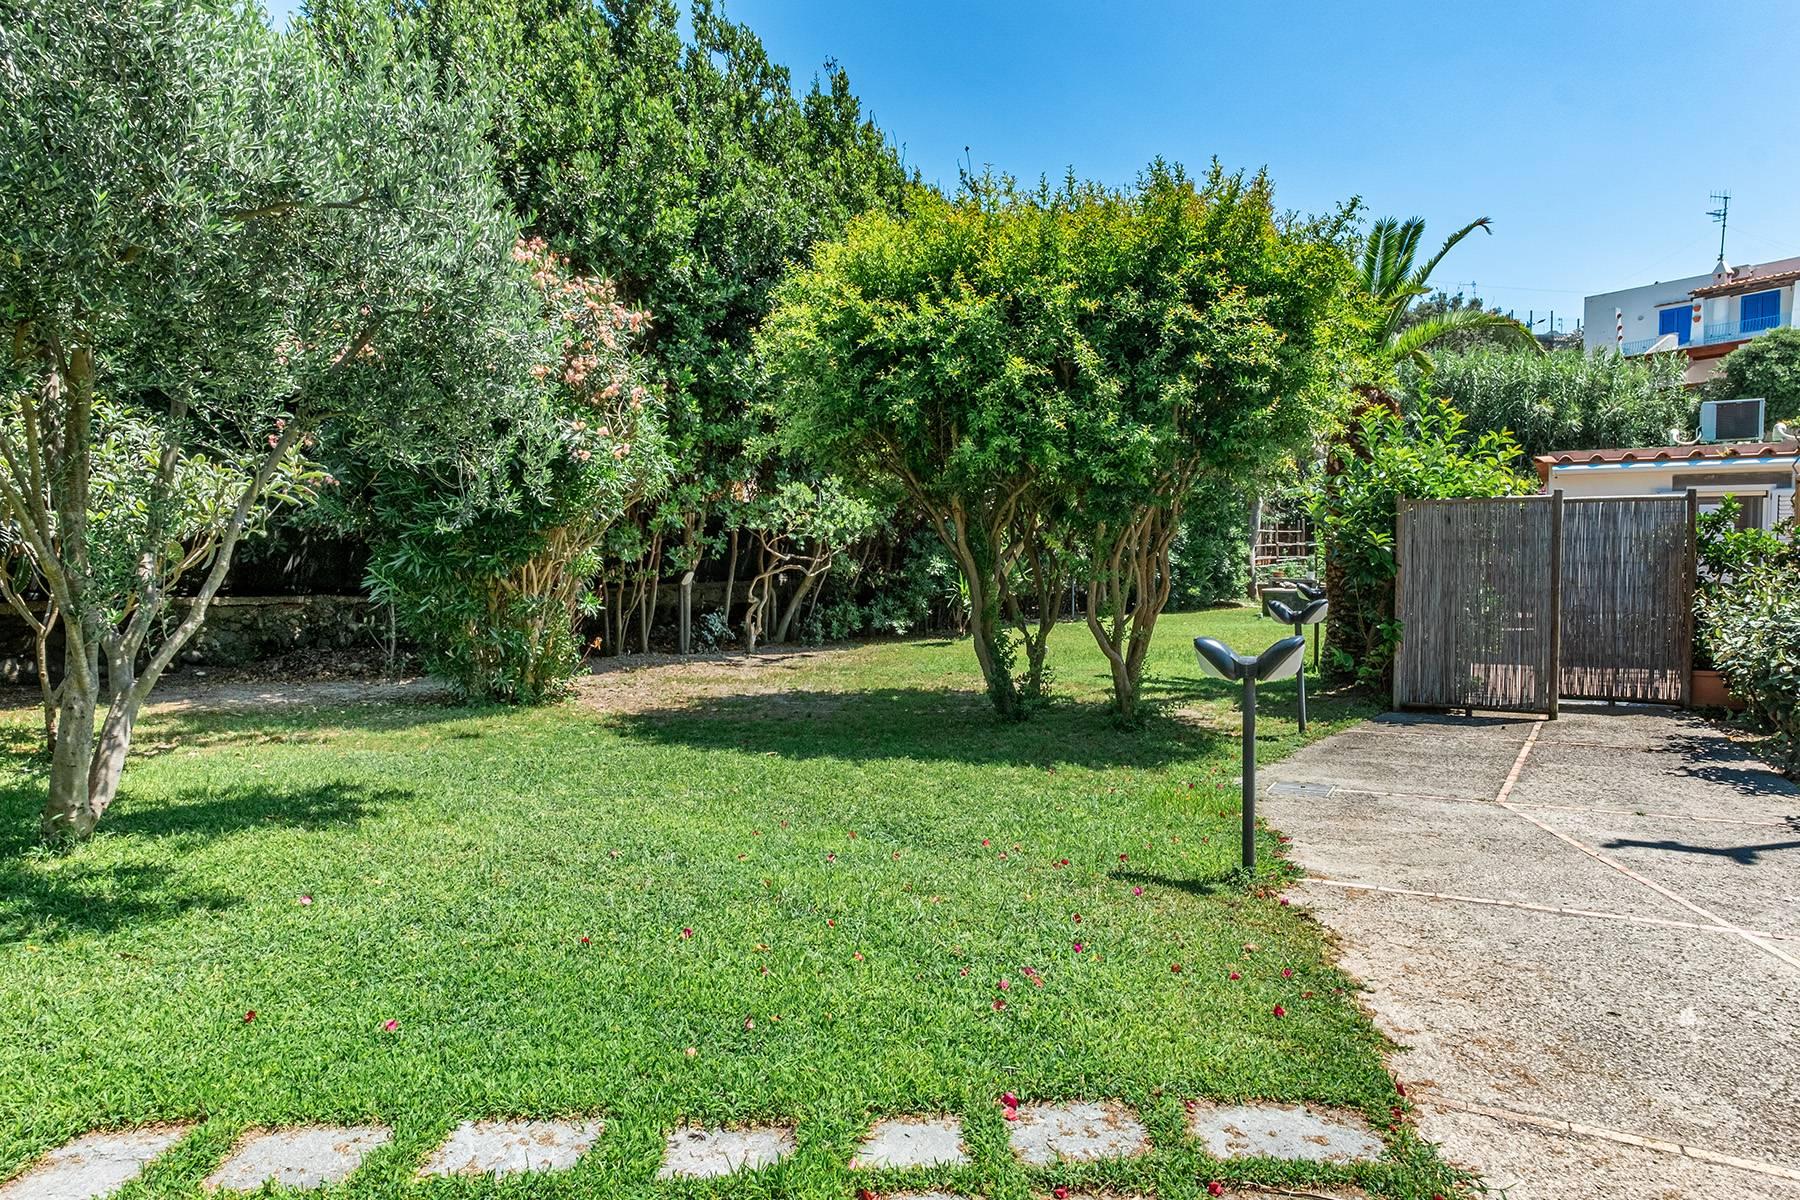 Villa in Vendita a Ischia: 5 locali, 400 mq - Foto 20